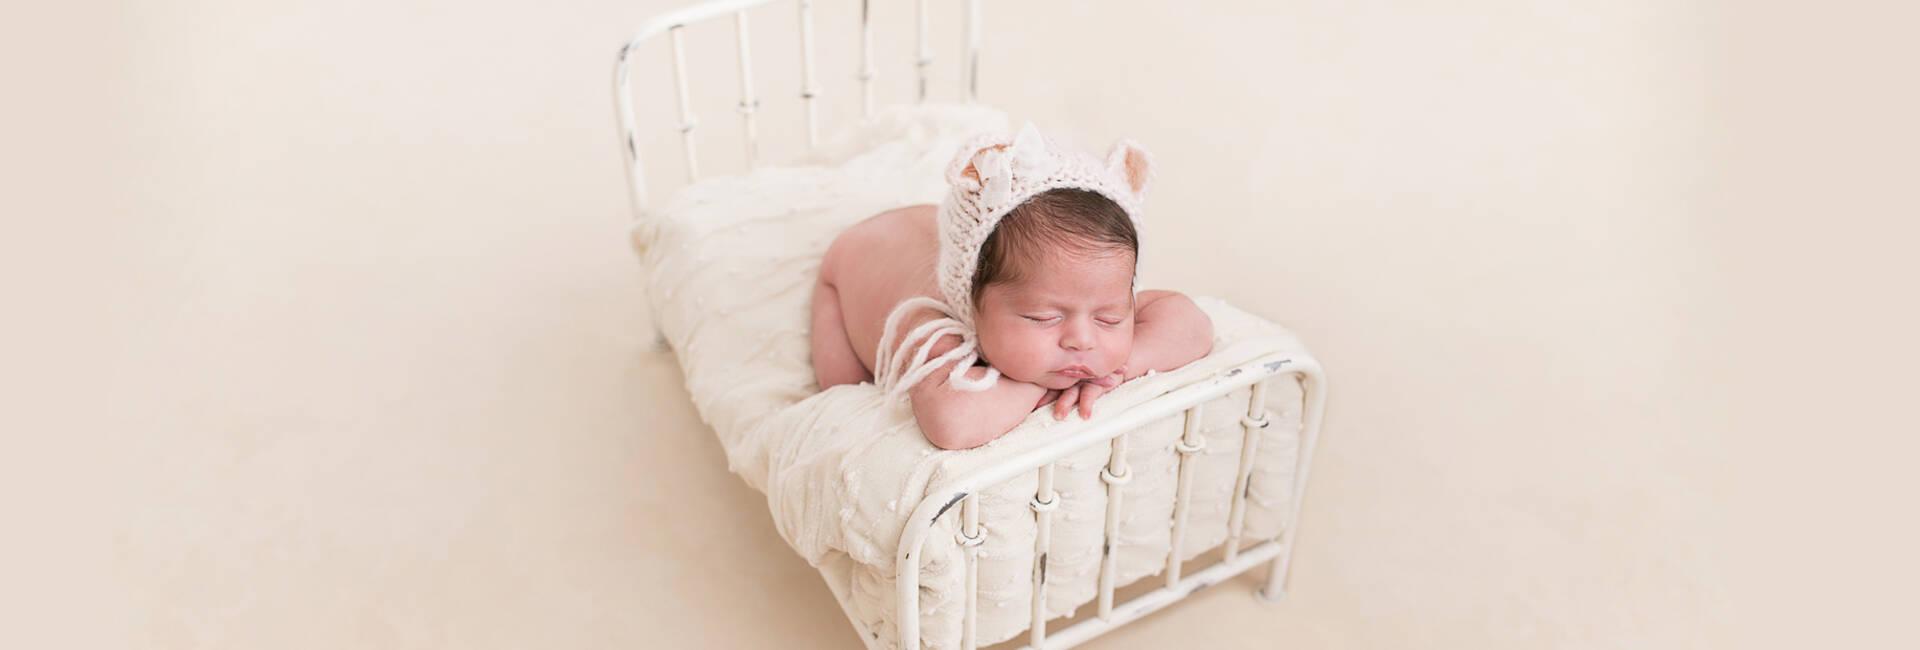 Newborn de ♥